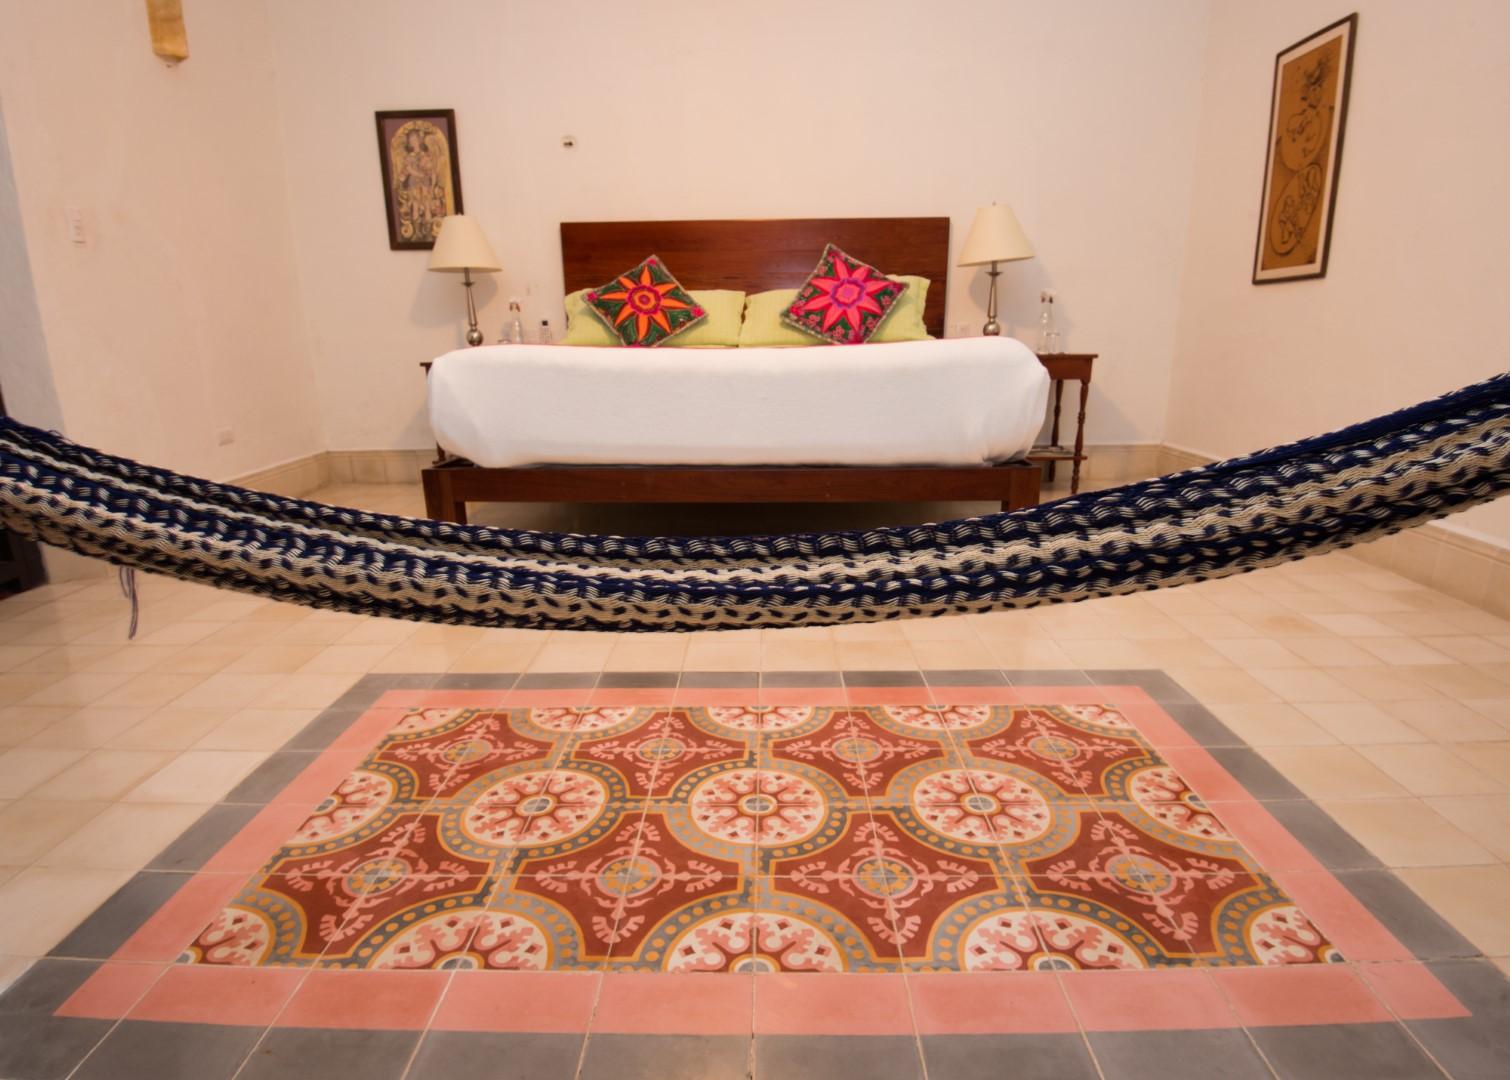 Room with hammock at Posada San Juan Valladolid